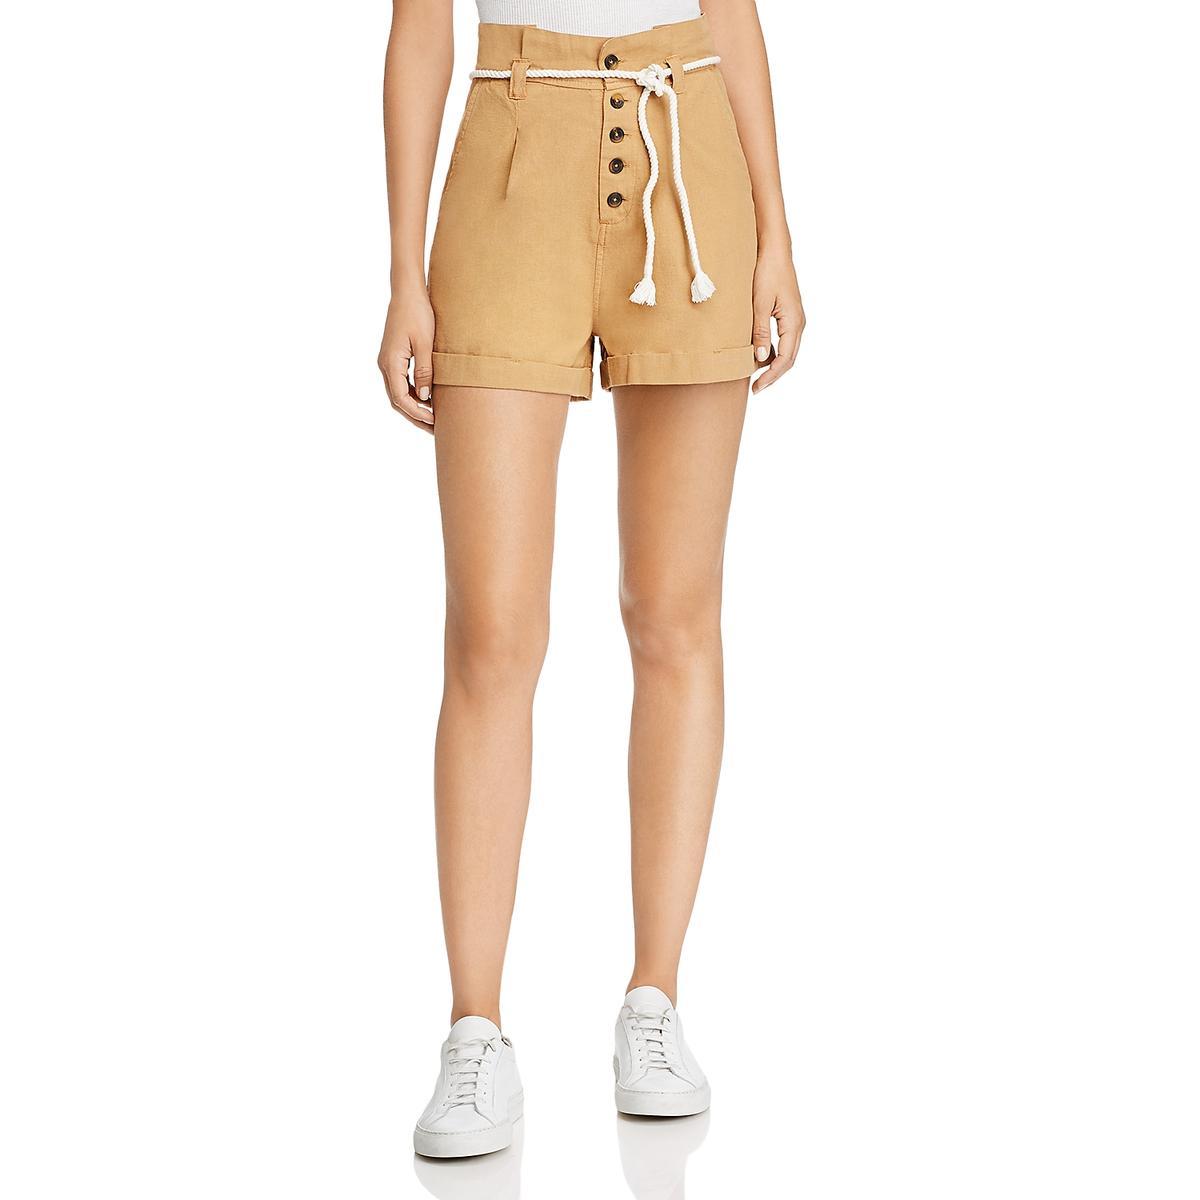 Maison Jules Womens High Rise Solid Paperbag Waist Shorts BHFO 3538